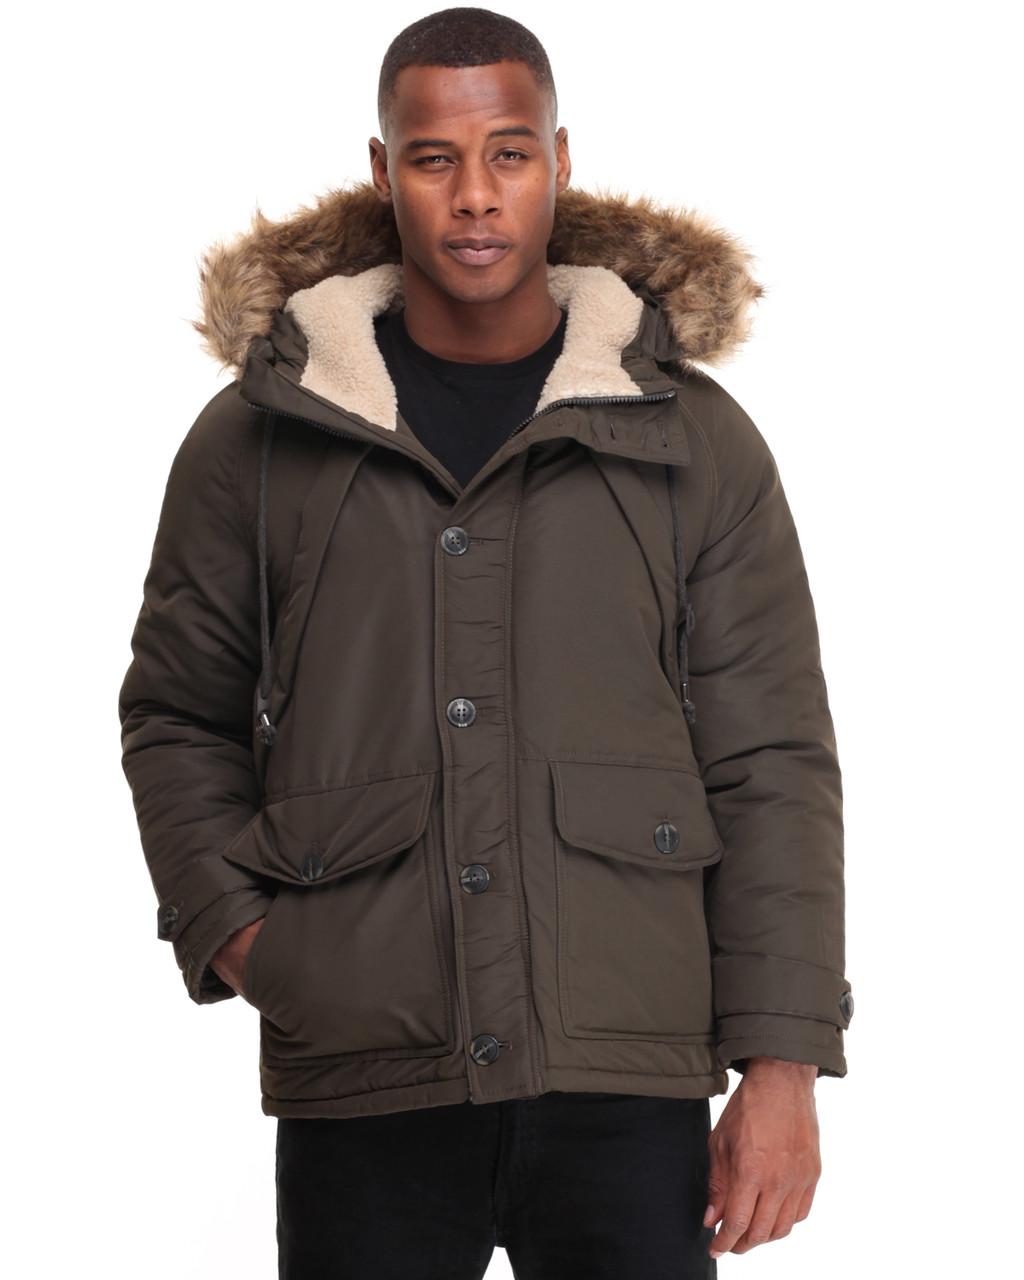 Куртка Steve Madden, XL, Olive, OMA051H, фото 1